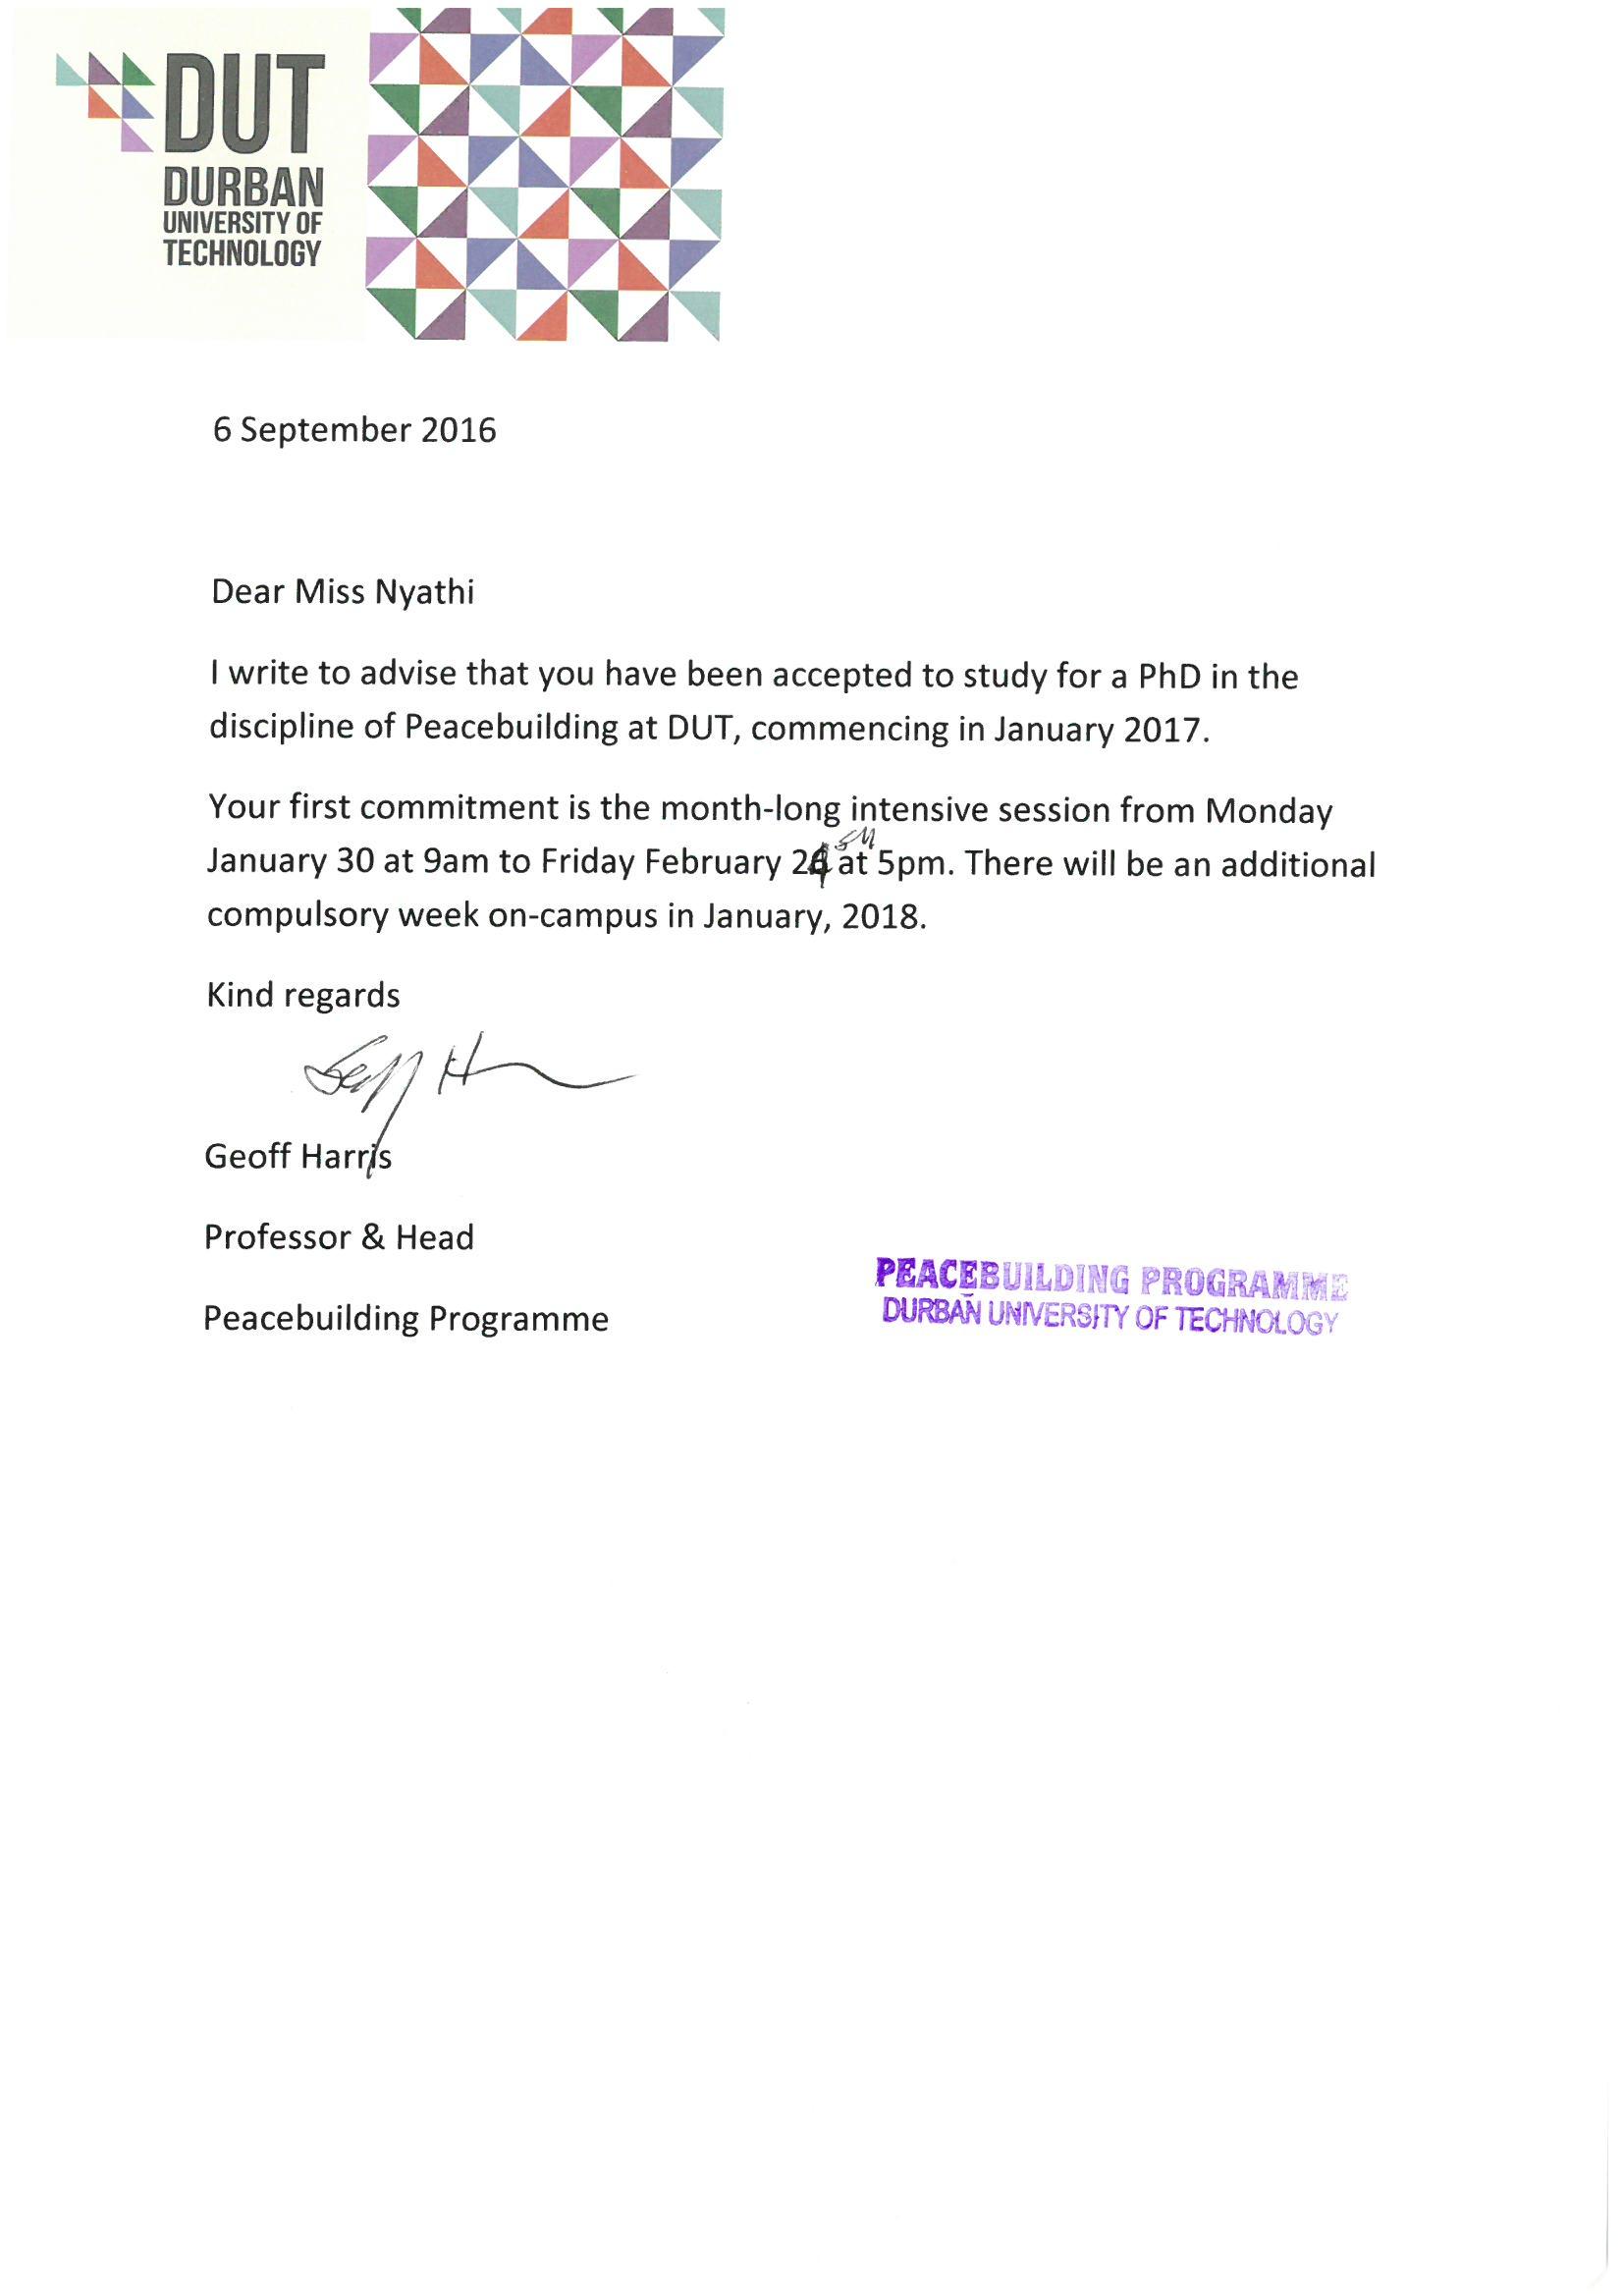 Acceptance letter durban university of technology acceptance letter altavistaventures Images